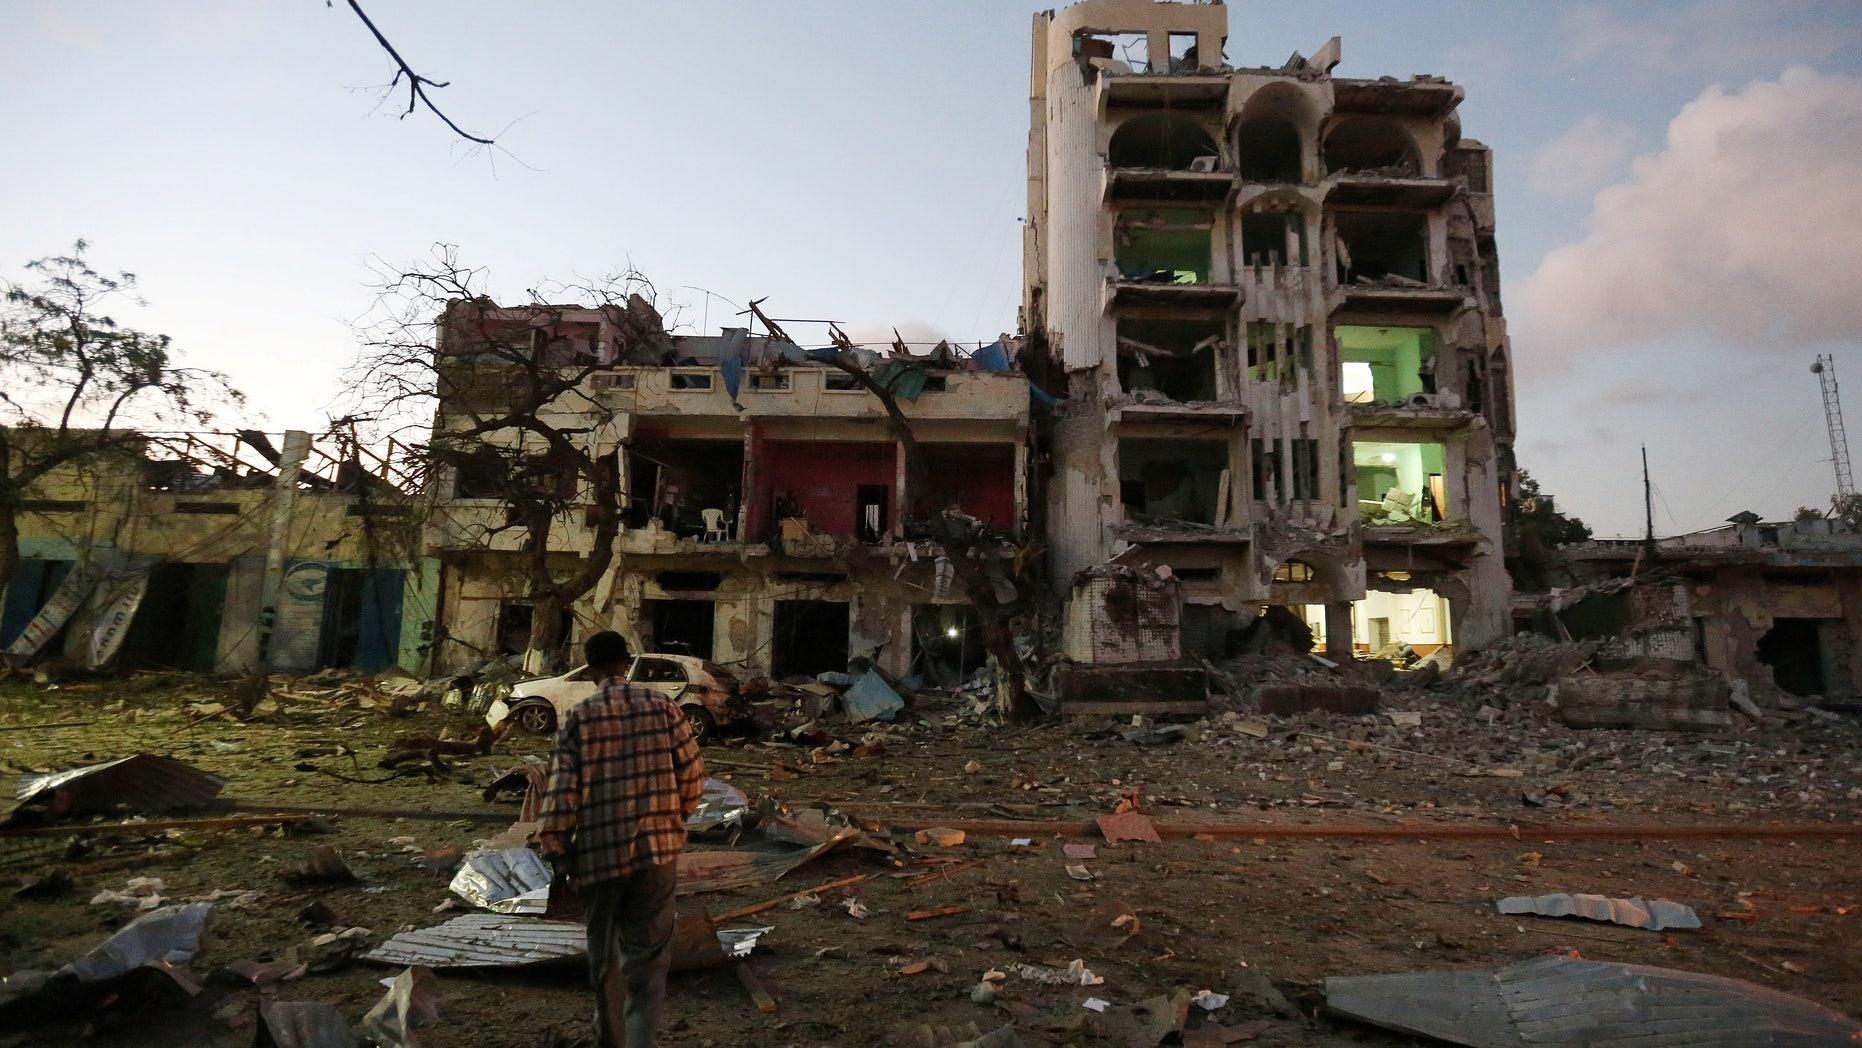 June 1, 2016: A man walks at the scene of a suicide car bombing outside Hotel Ambassador on Maka Al Mukaram Road in Somalia's capital Mogadishu. (Reuters)